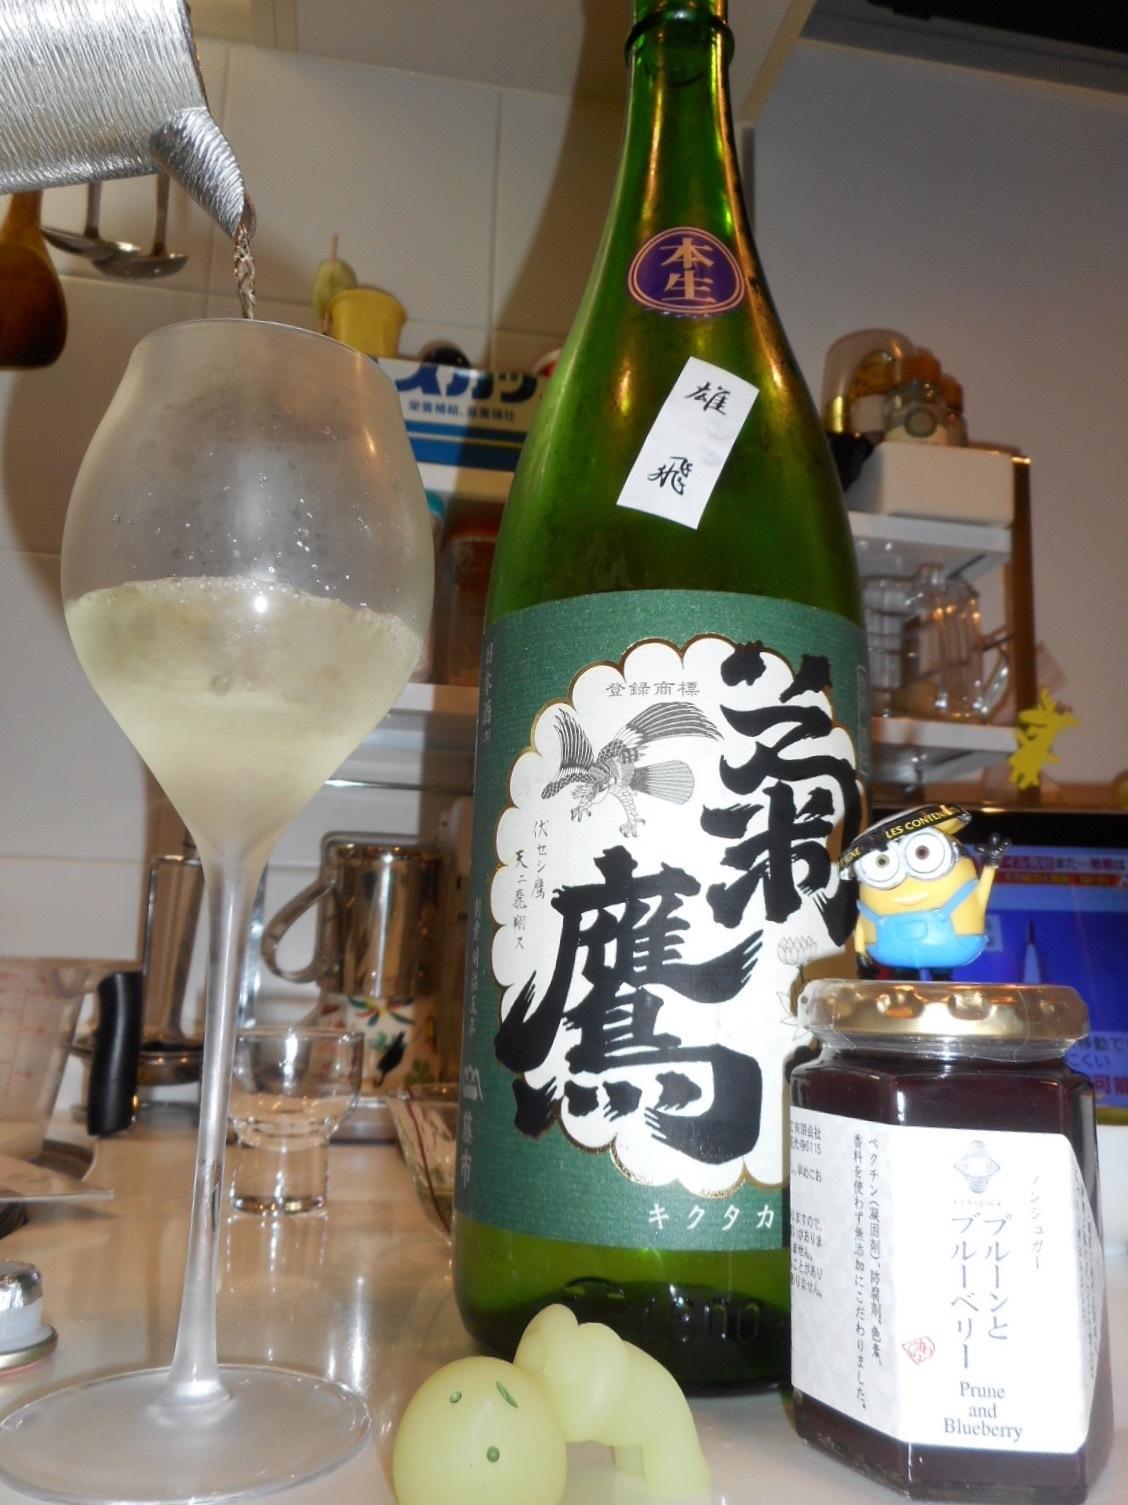 kikutaka_yuuhi_2nen_jukusei12.jpg